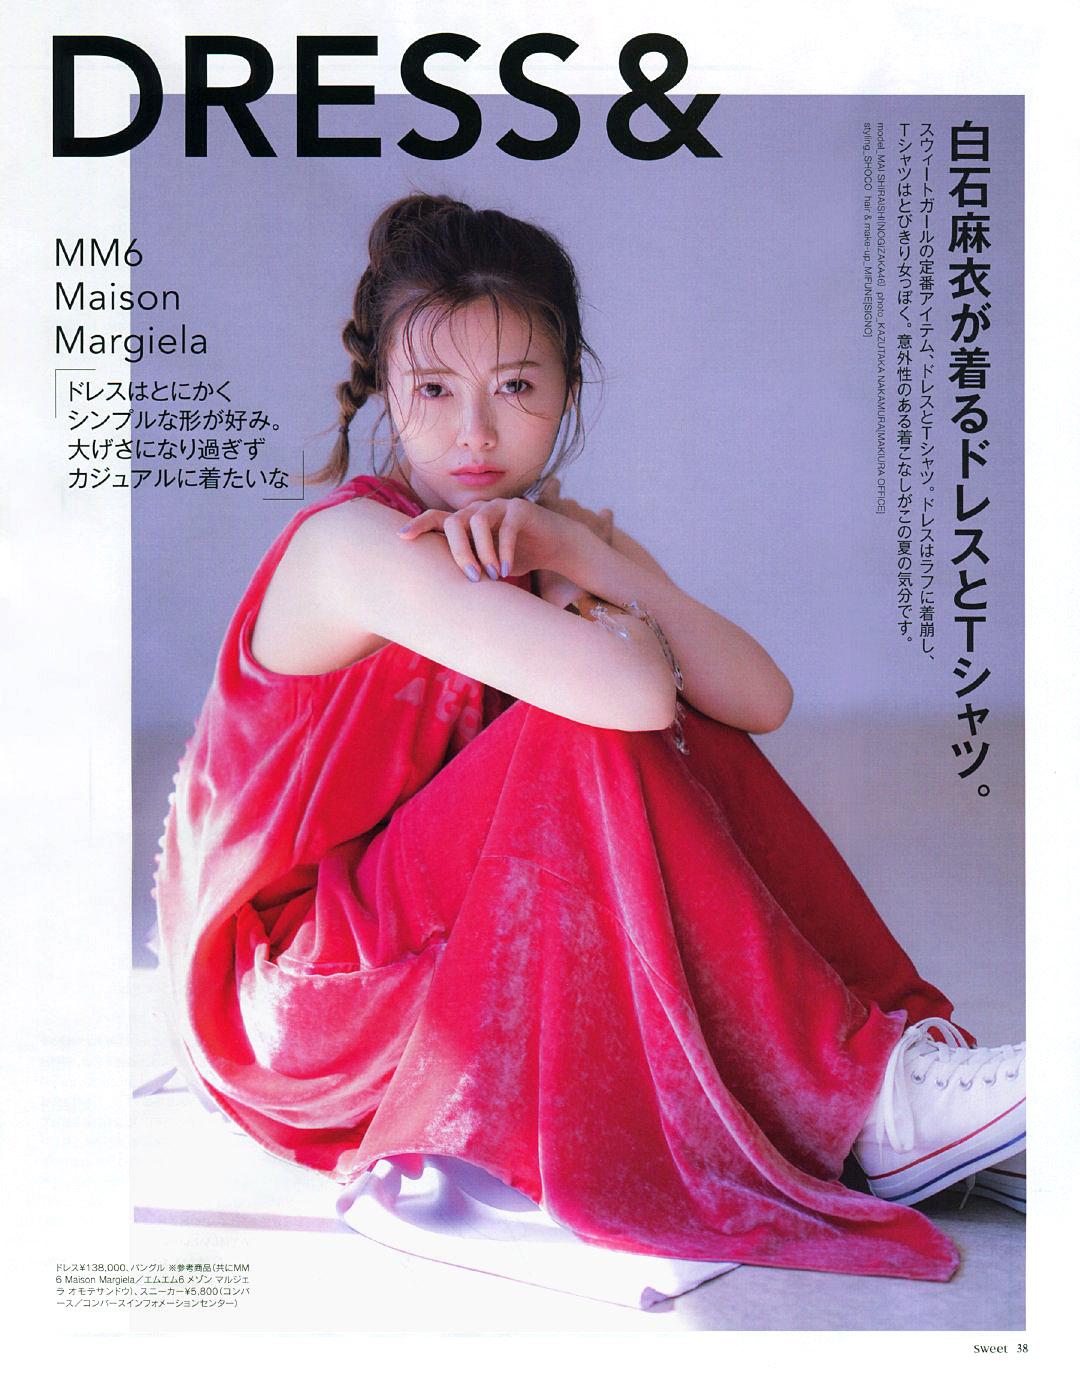 MShiraishi Sweet 1906 01.jpg